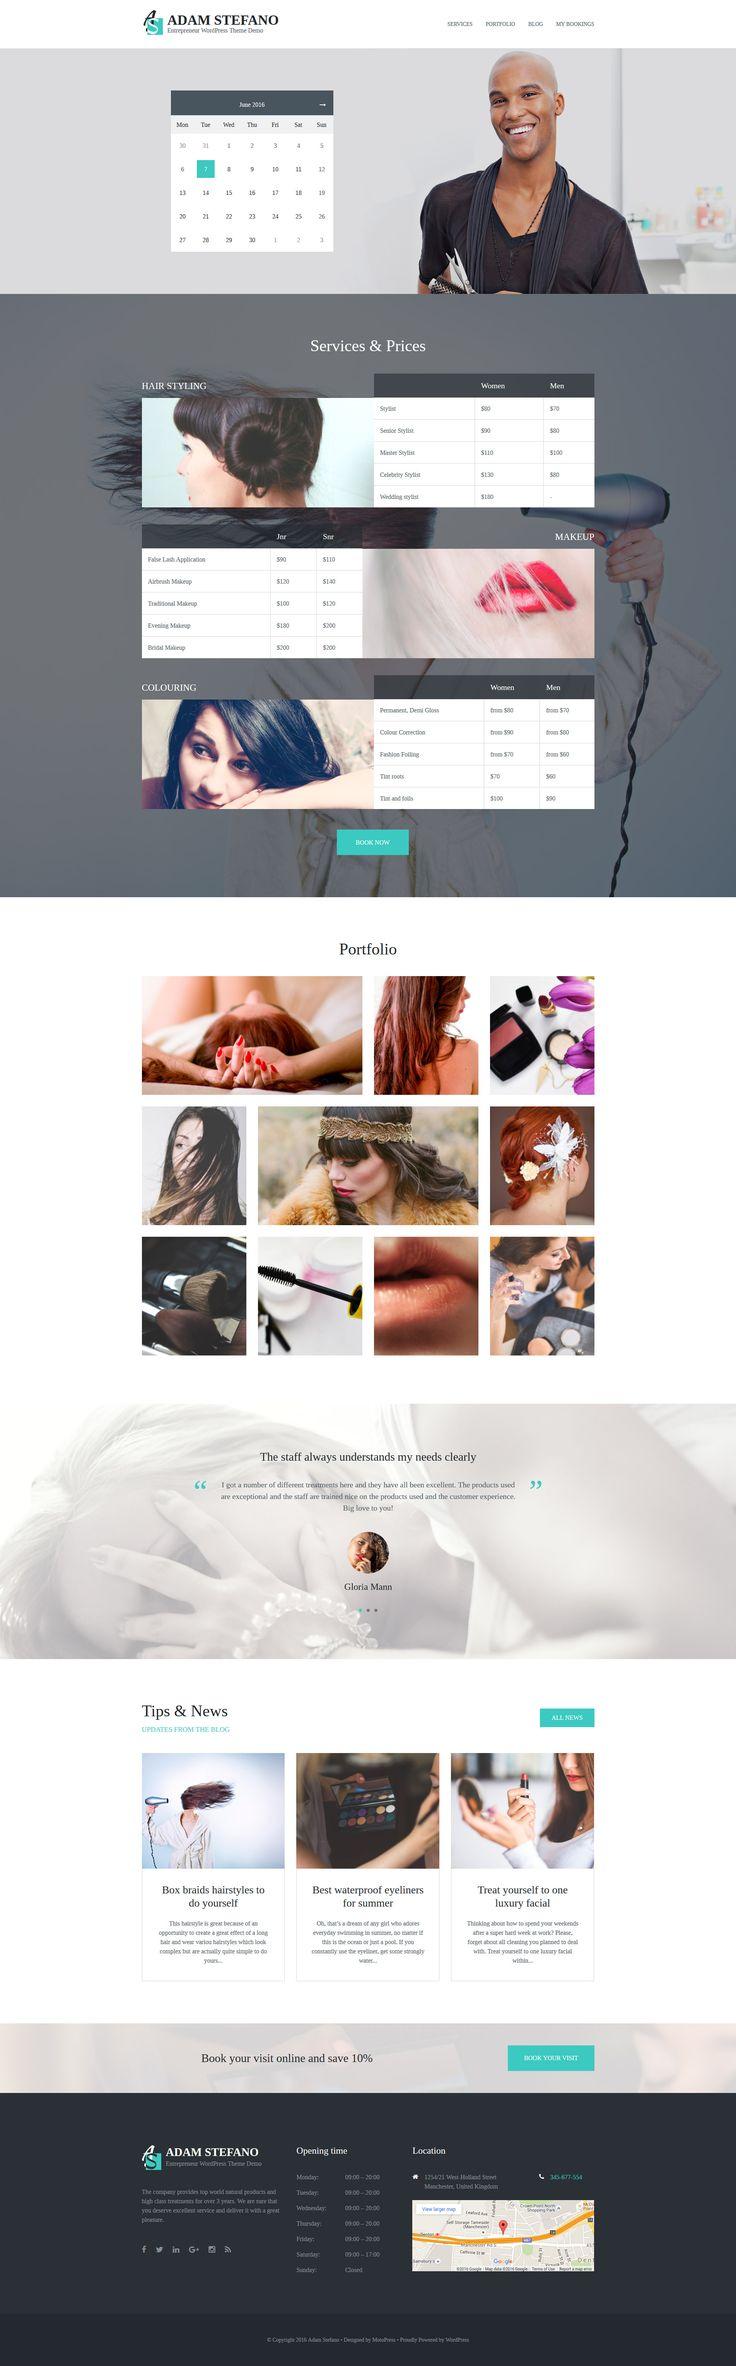 Mejores 269 imágenes de WordPress Themes en Pinterest   Plantilla ...